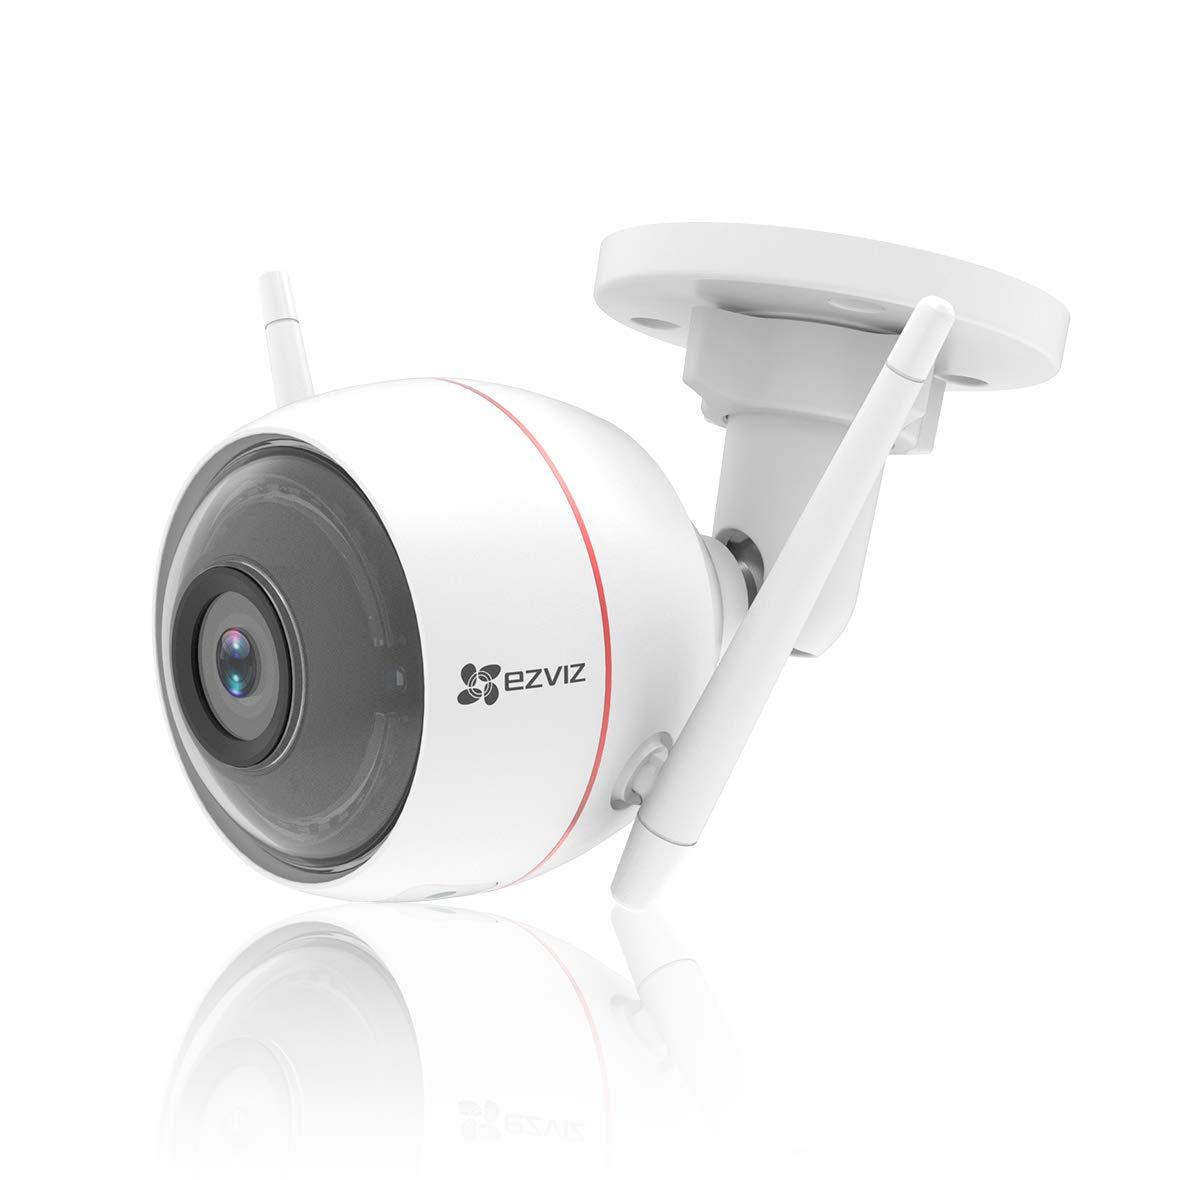 EZVIZ 200万画素 防犯カメラ 屋外 防犯カメラ 200万画素 強力Wi-Fi 警報音 防塵防水 日本語説明書 ワイヤレス B07JQGVCS7 LEDライト付 SDカード無 C3W microSDカードなし B07JQGVCS7, 高品質:ee69a005 --- krianta.ru